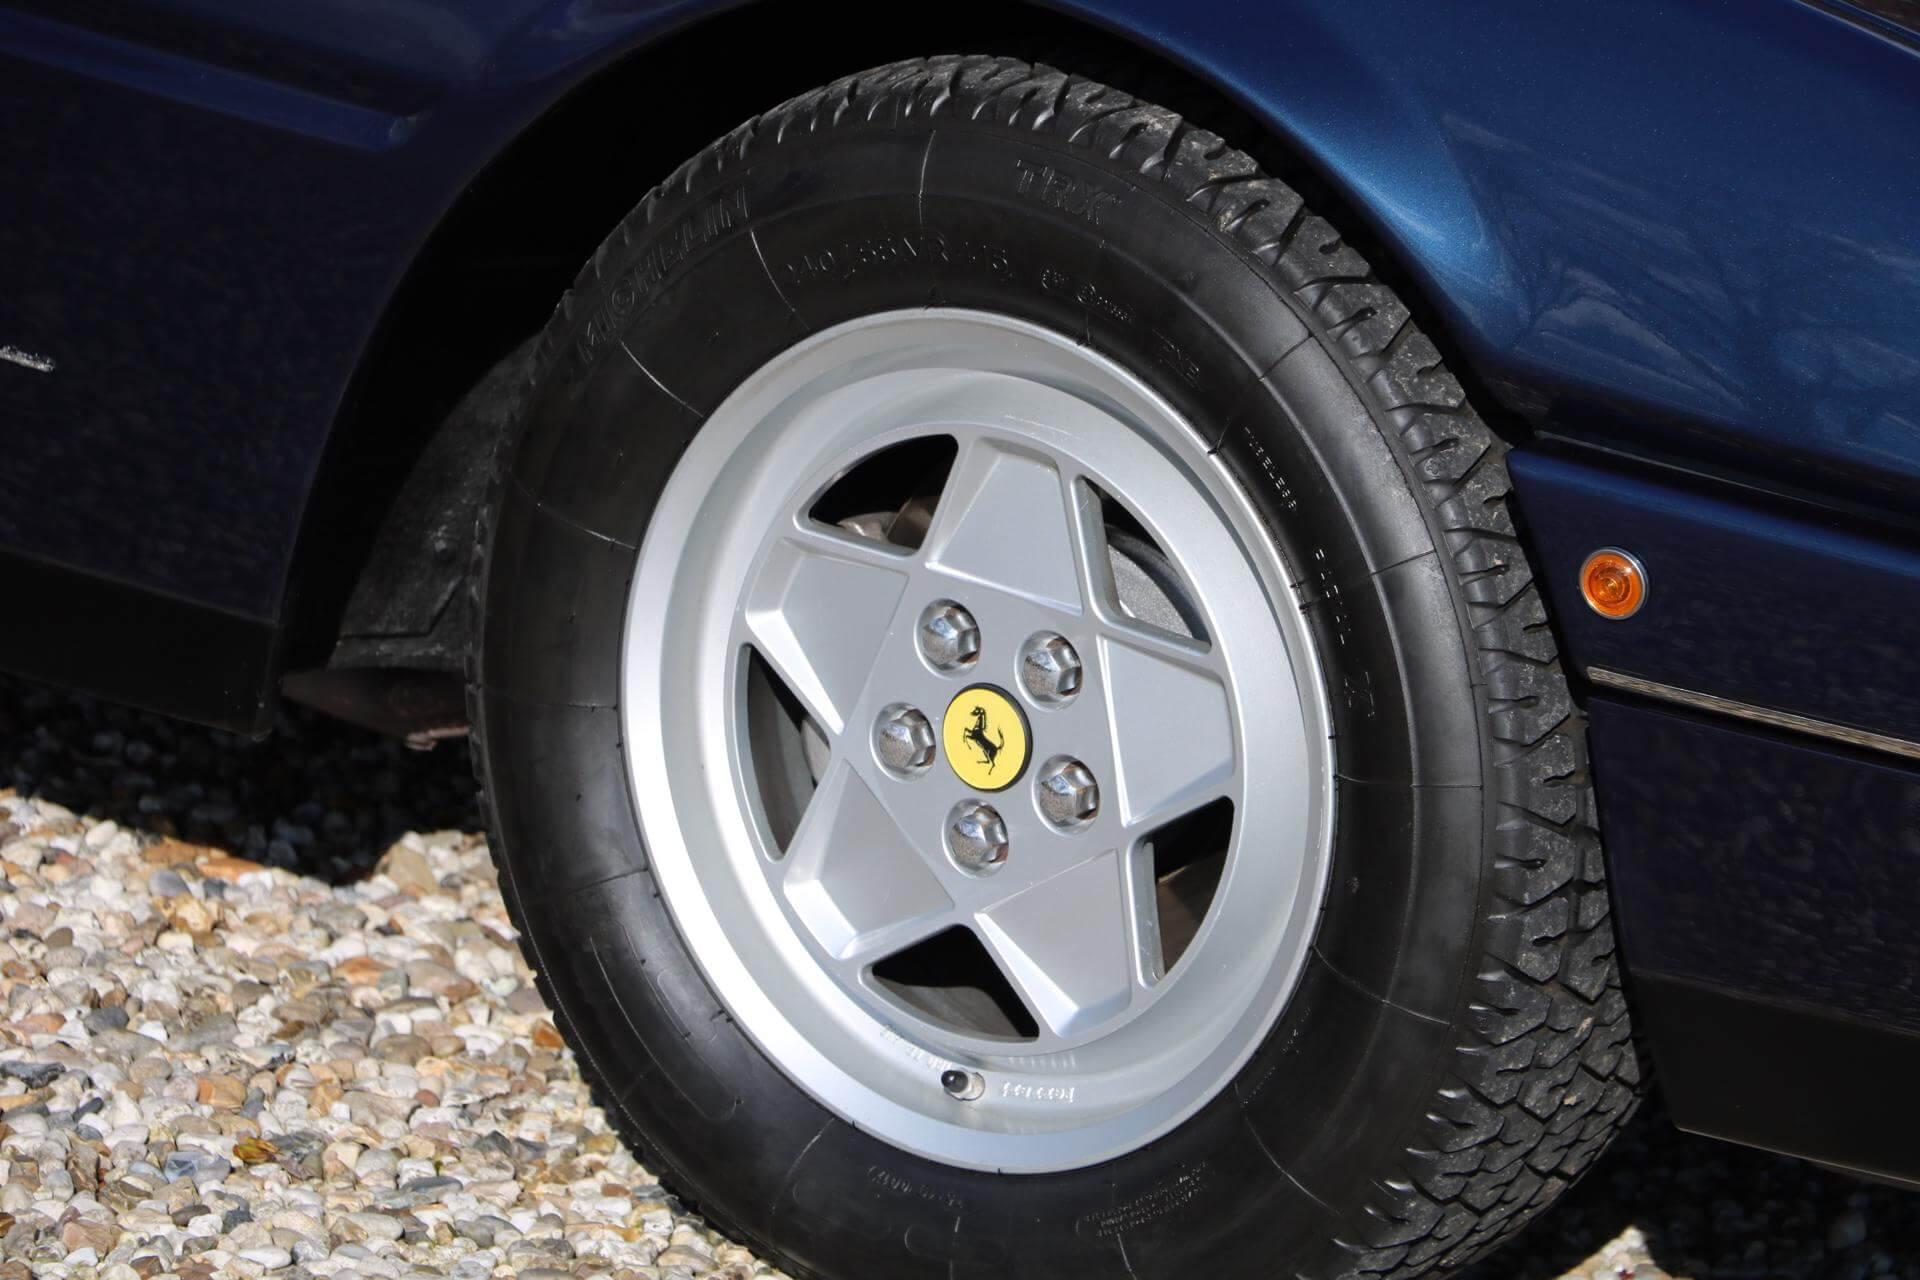 Real Art on Wheels | 1986 Ferrari 412